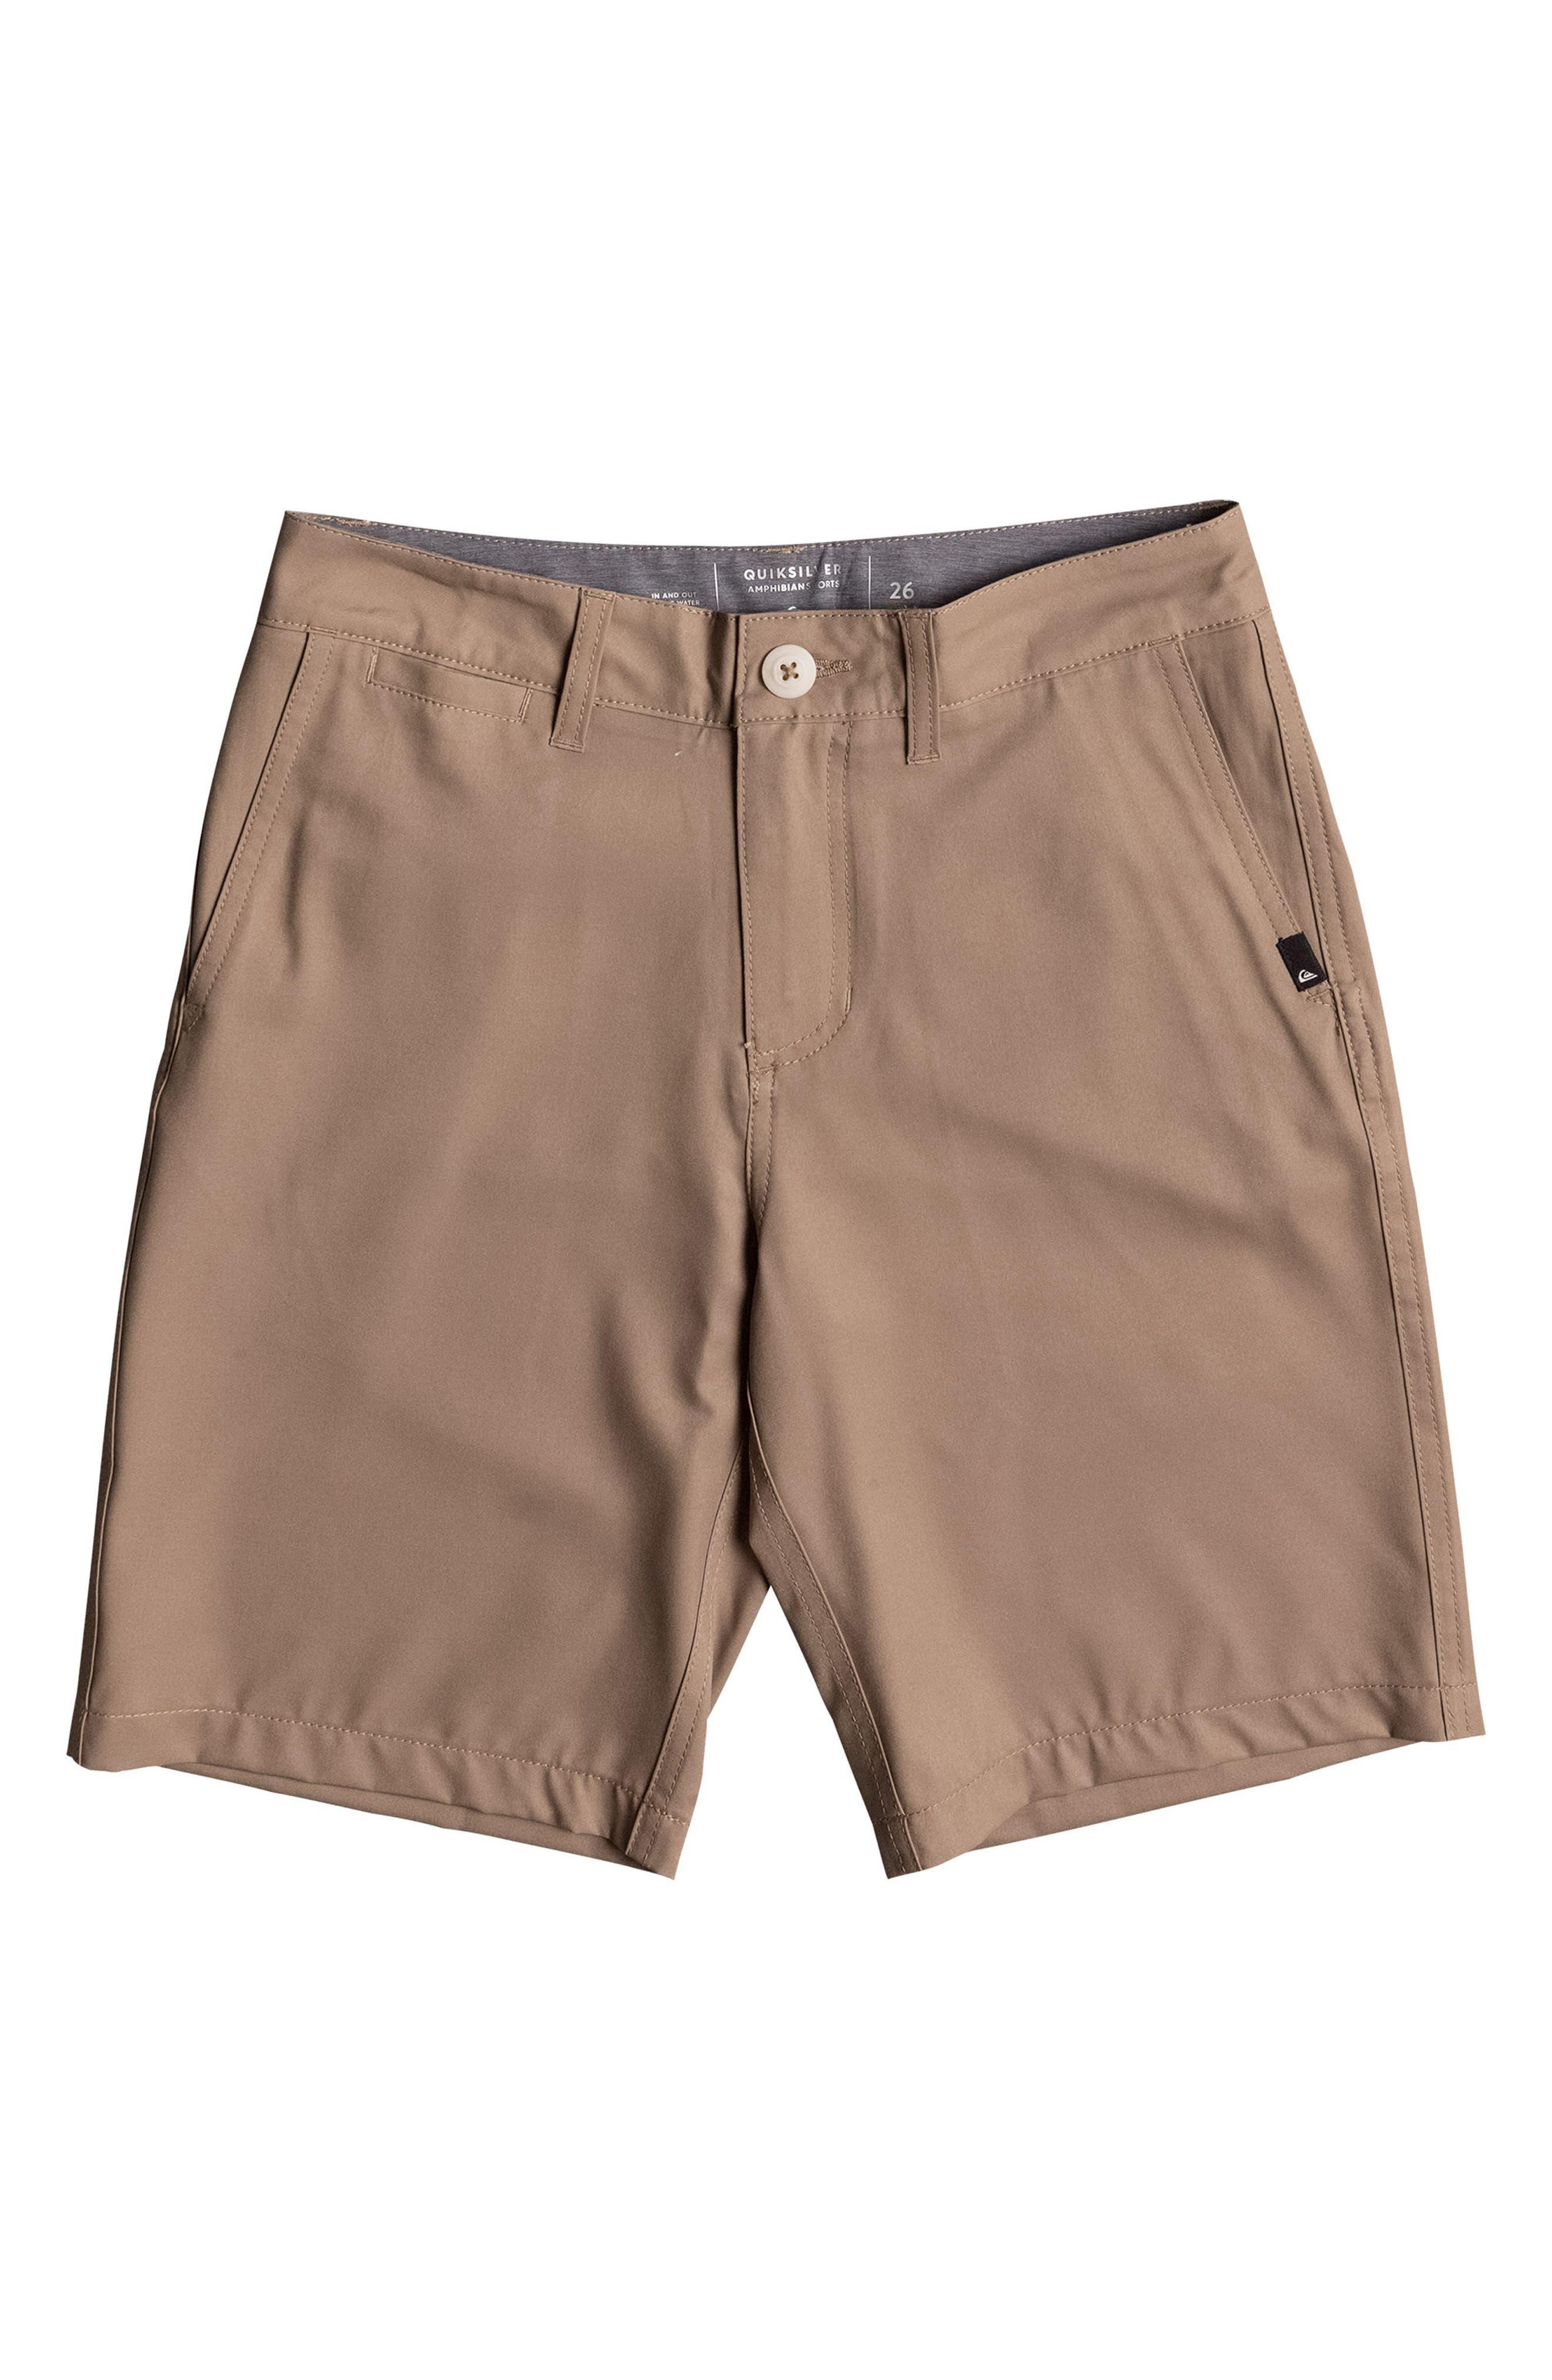 Quiksilver Union Amphibian Shorts (Big Boys)